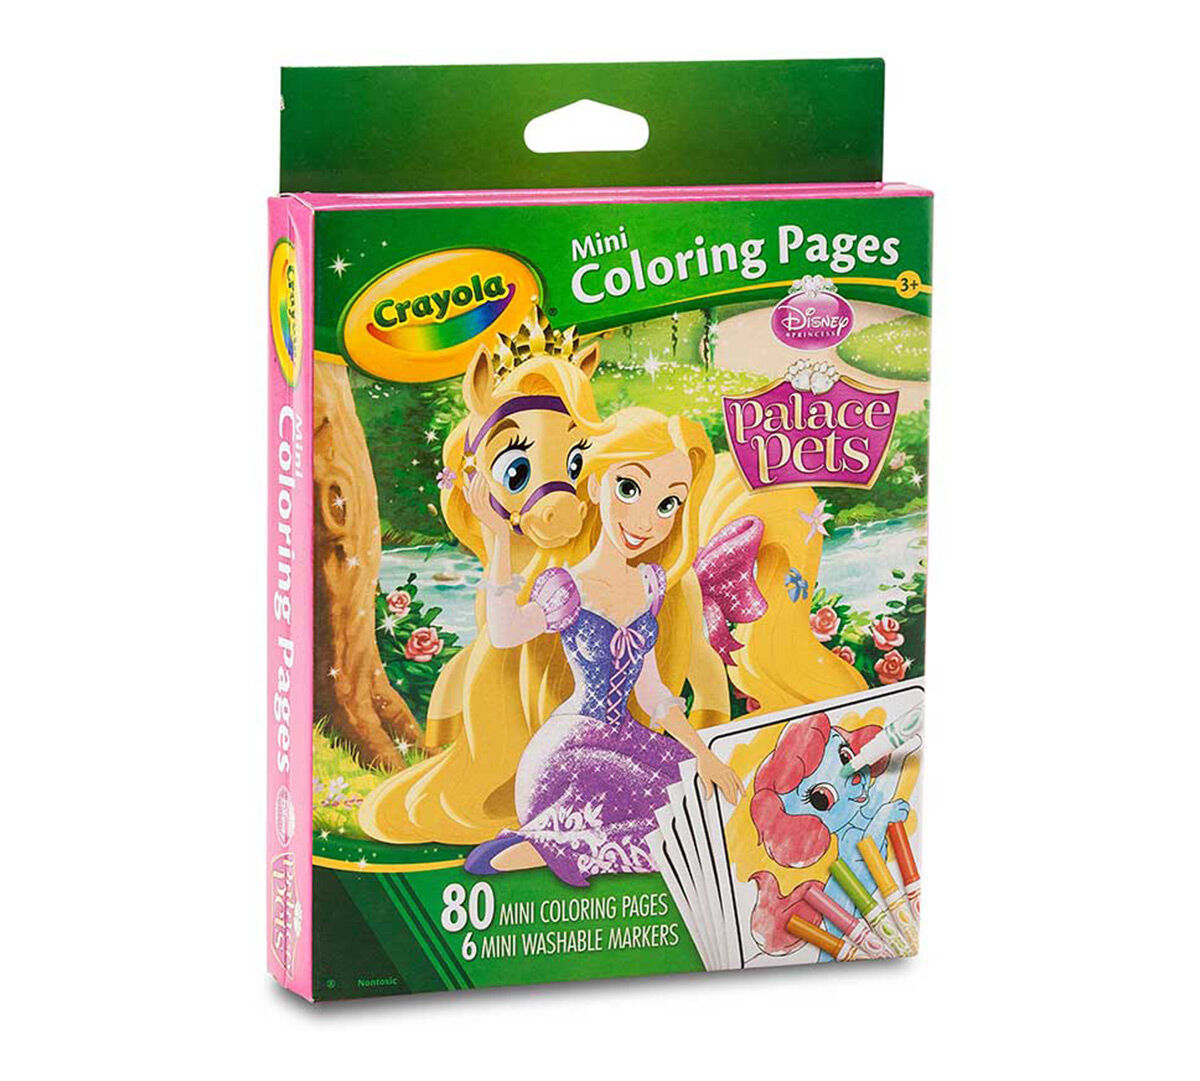 Mini Coloring Pages Disney Princess Palace Pets - Crayola